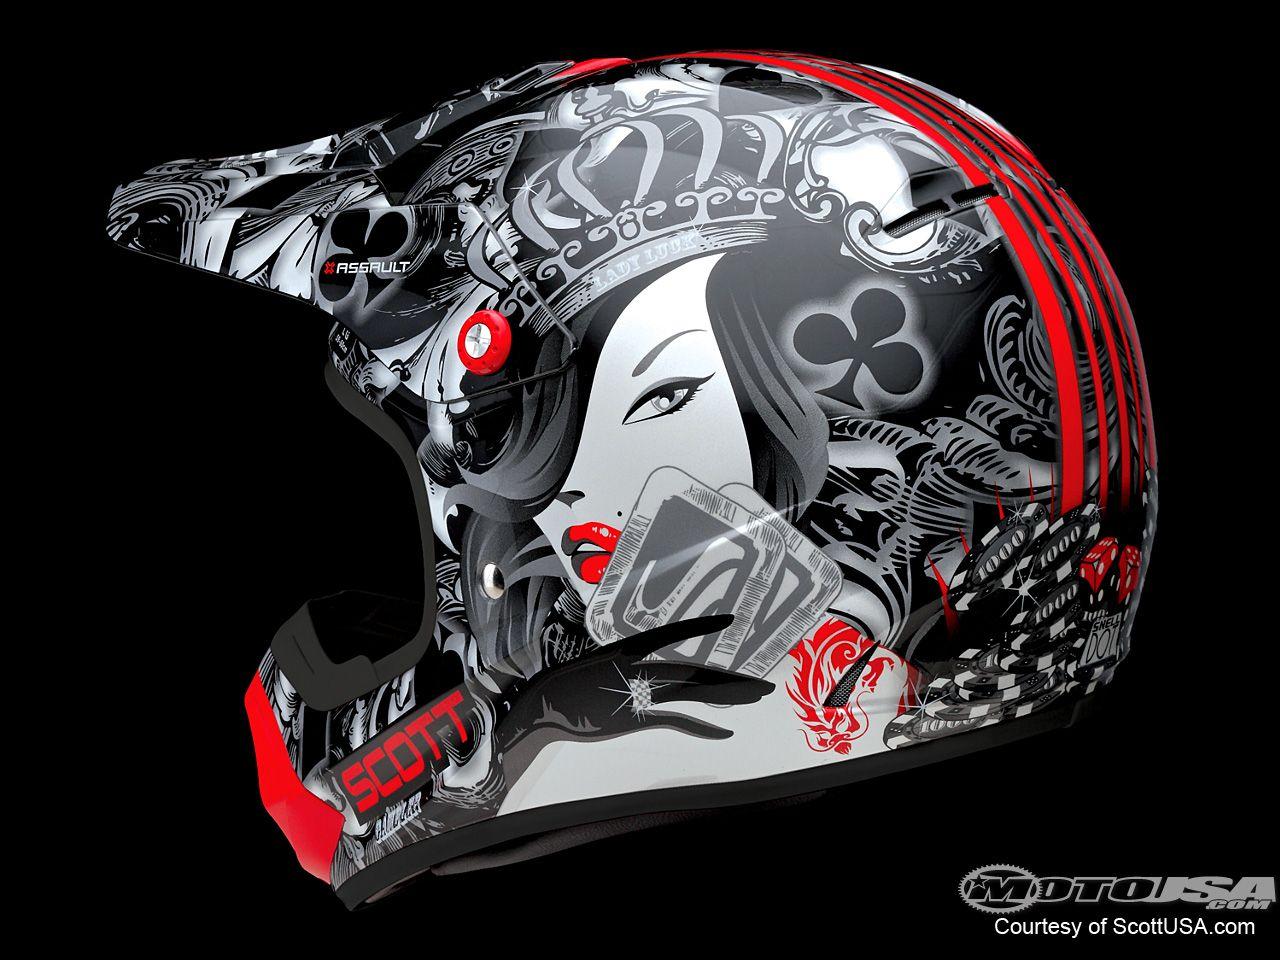 Motocross Helmet Stickers Szukaj W Google Helmets Pinterest - Custom motorcycle helmet stickers and decalssimpson motorcycle helmets